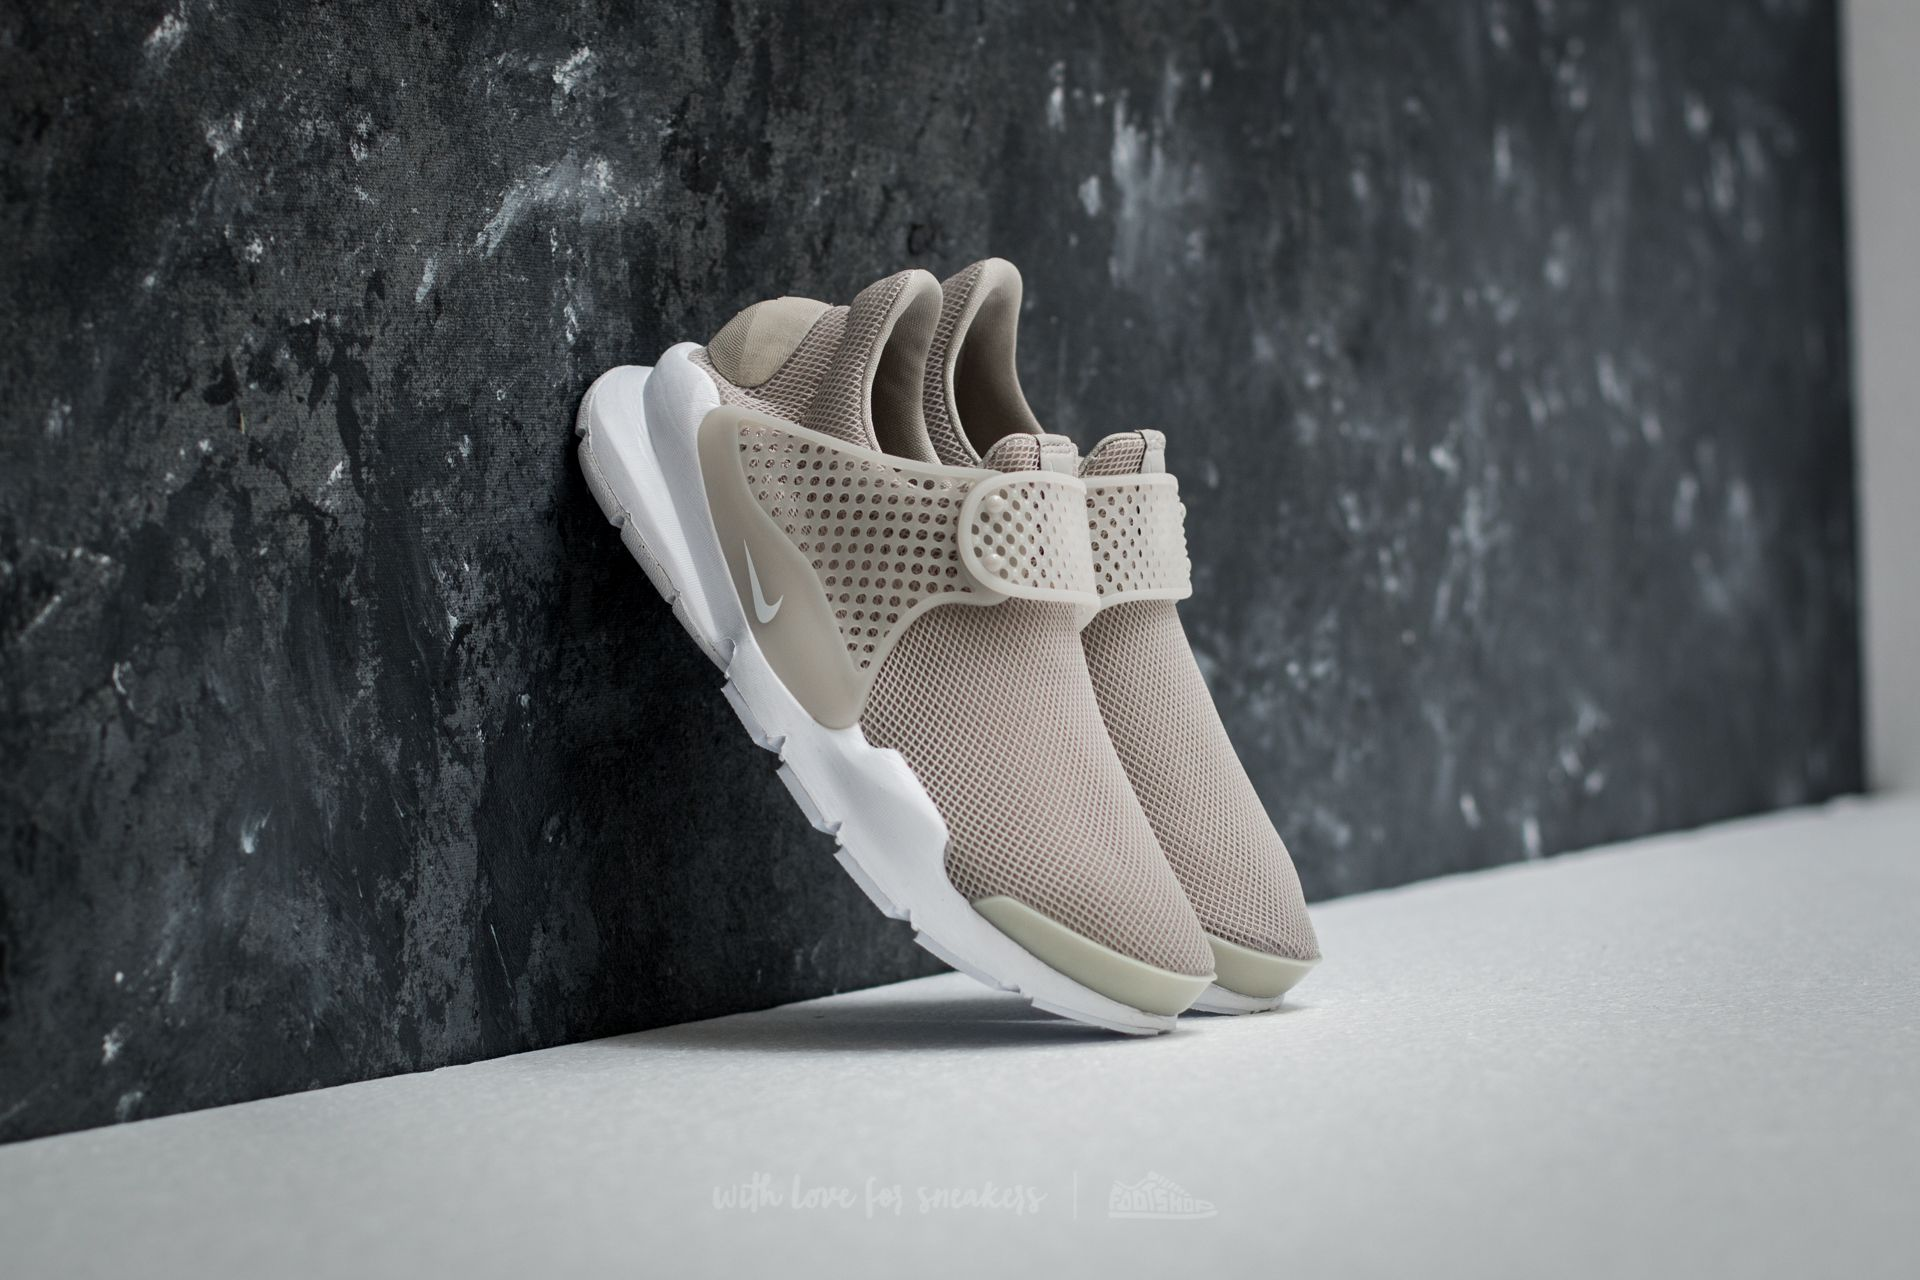 designer fashion 9b74b 17140 Nike Wmns Sock Dart Br. Pale Grey  White-Glacier Blue